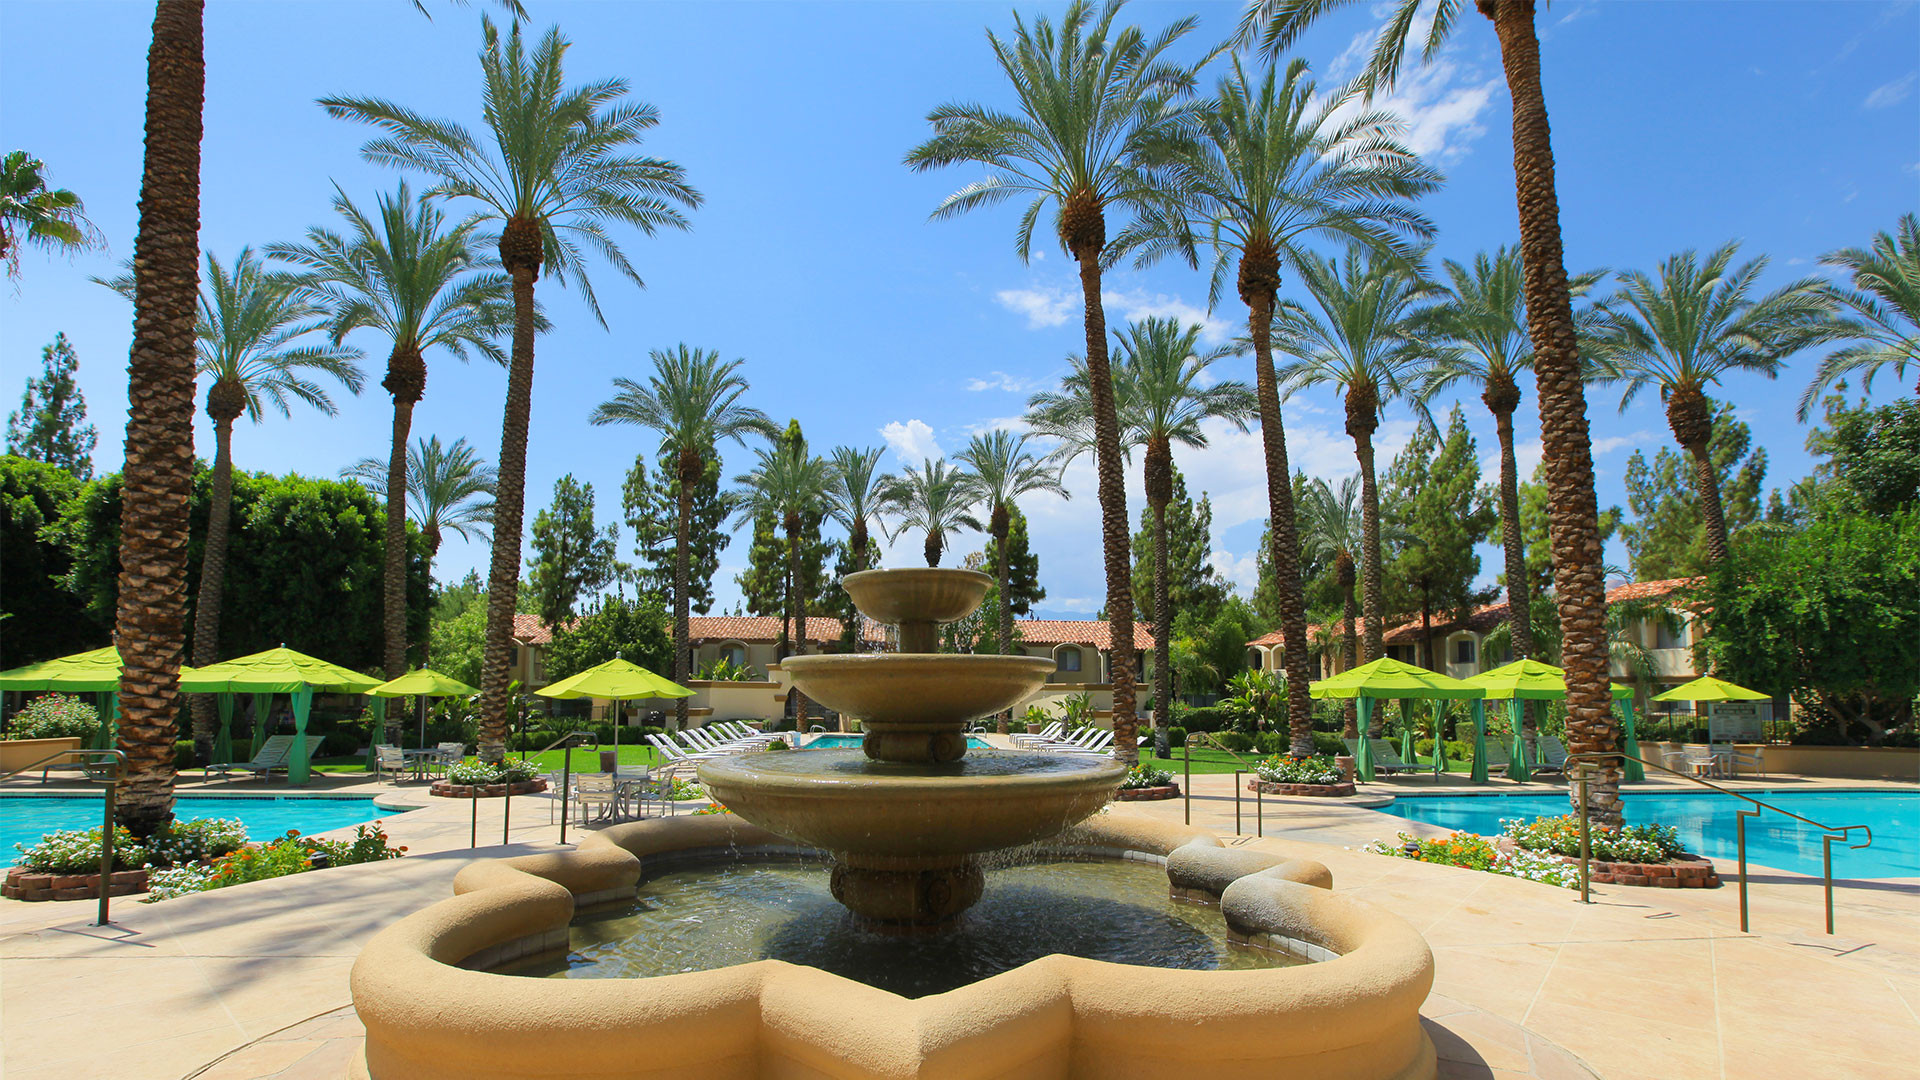 Hotels Palm Dessert Ca  Hotel Resort Palm Desert Resort Country Club Golf